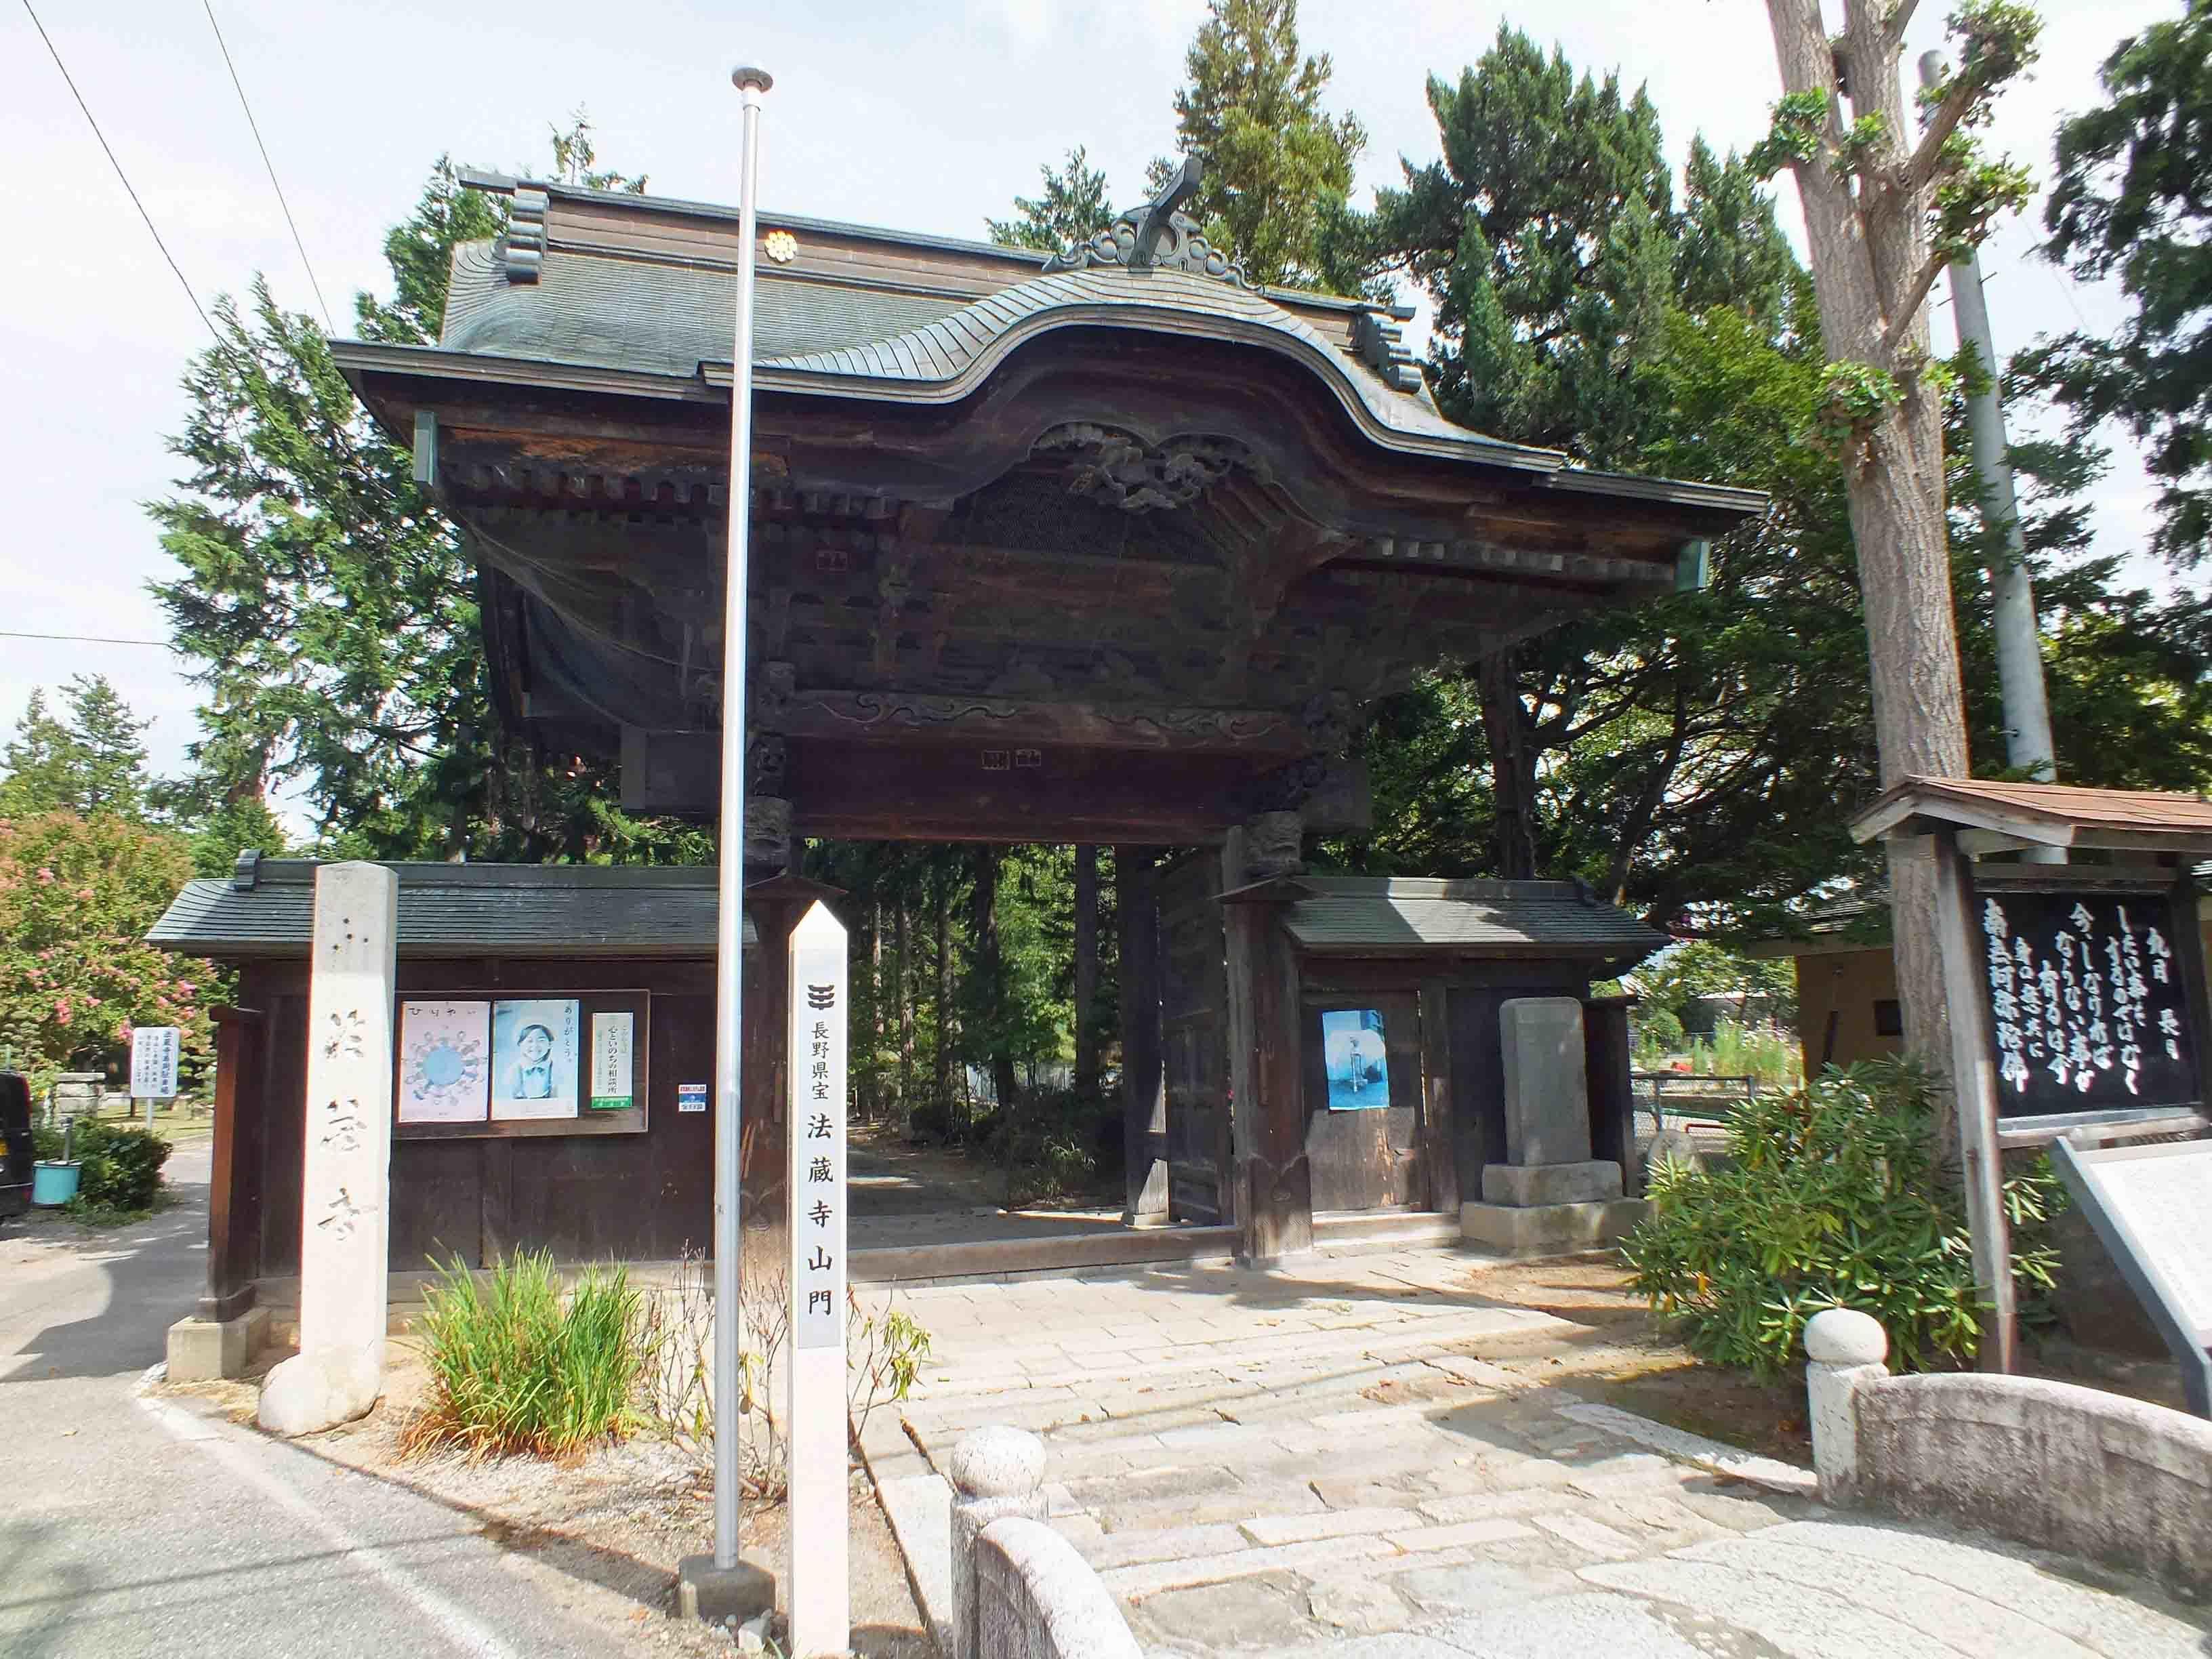 DSCF5489法蔵寺山門